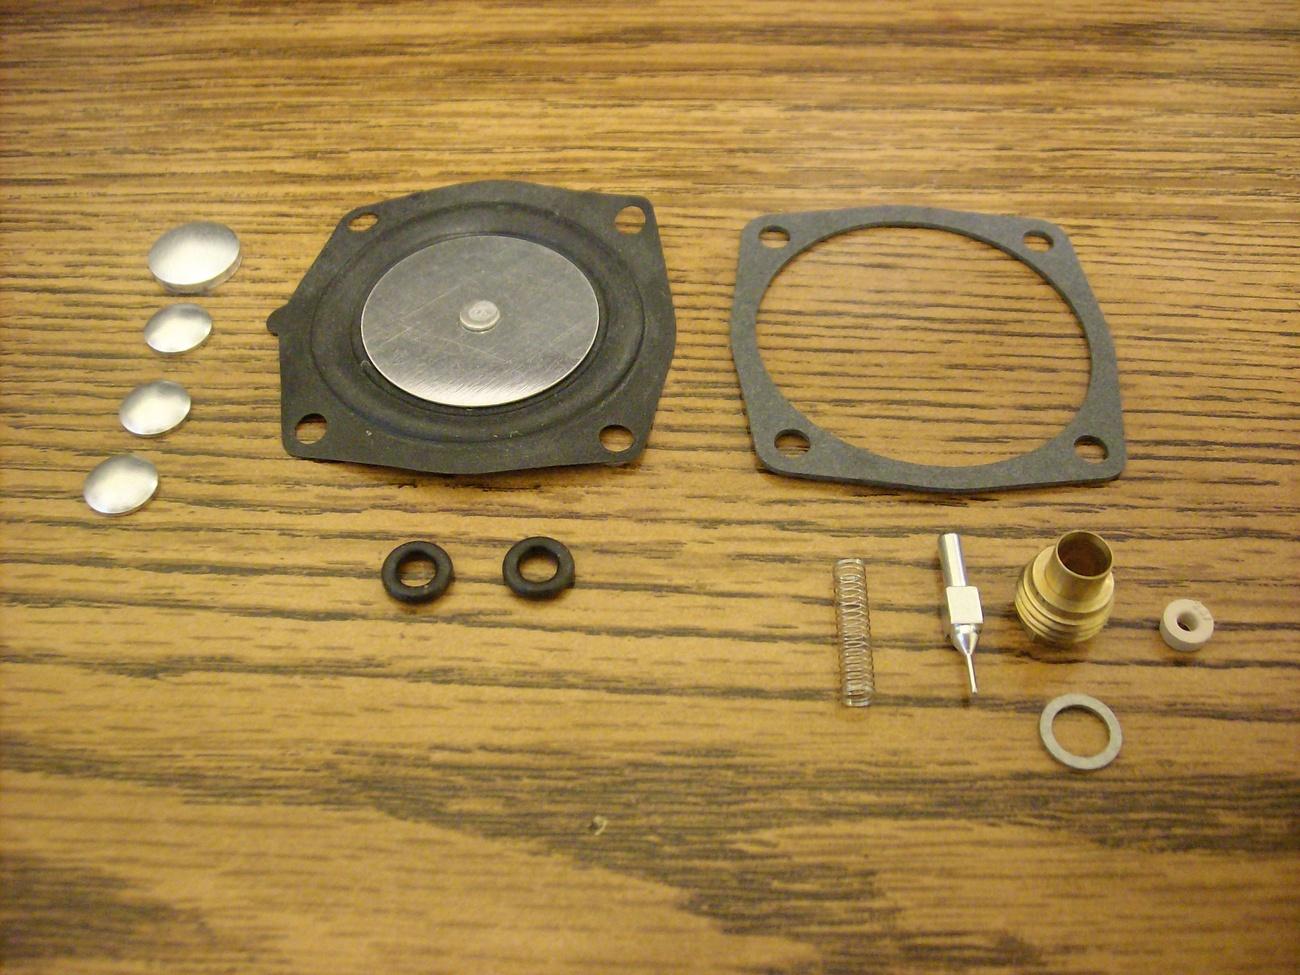 Toro S200 Snowthrower Carburetor Rebuild Kit And 14 Similar Items 056 094 001